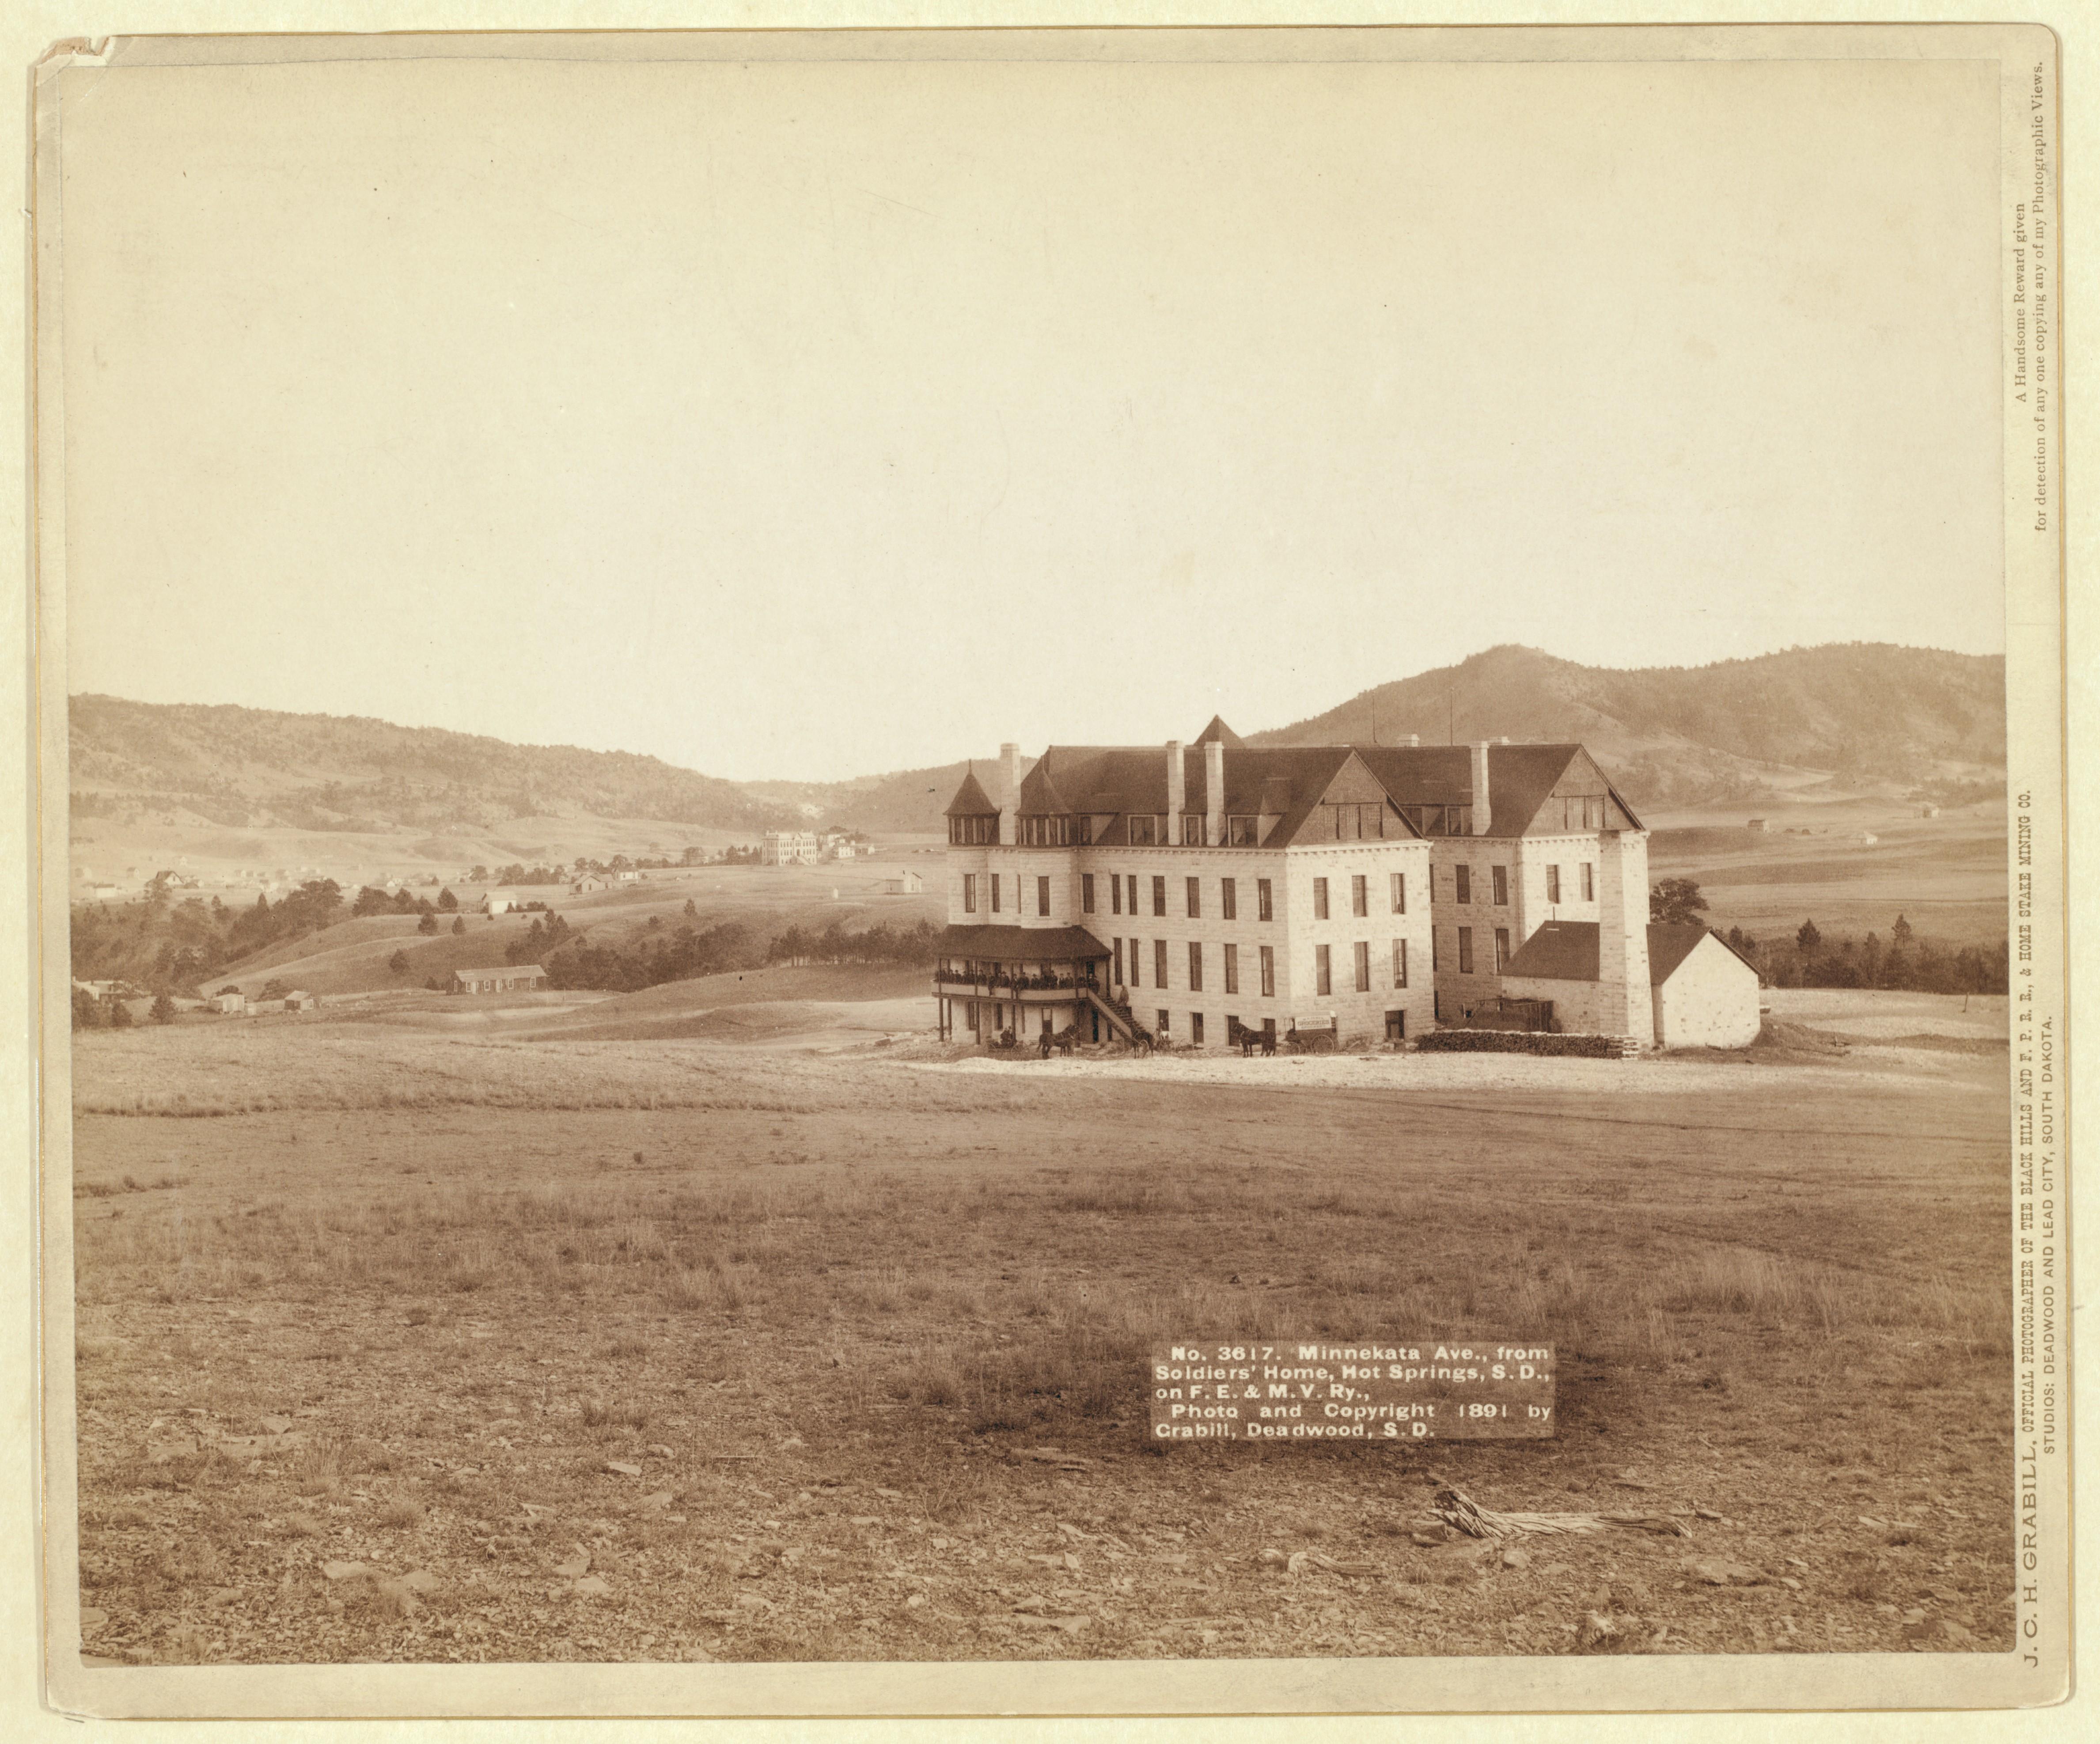 Фотографии Дикого Запада 1887-1892 (John C.H. Grabill ...: http://nevsepic.com.ua/nostalgiya/19401-fotografii-dikogo-zapada-1887-1892-john-c.h.-grabill-collection-187-foto.html